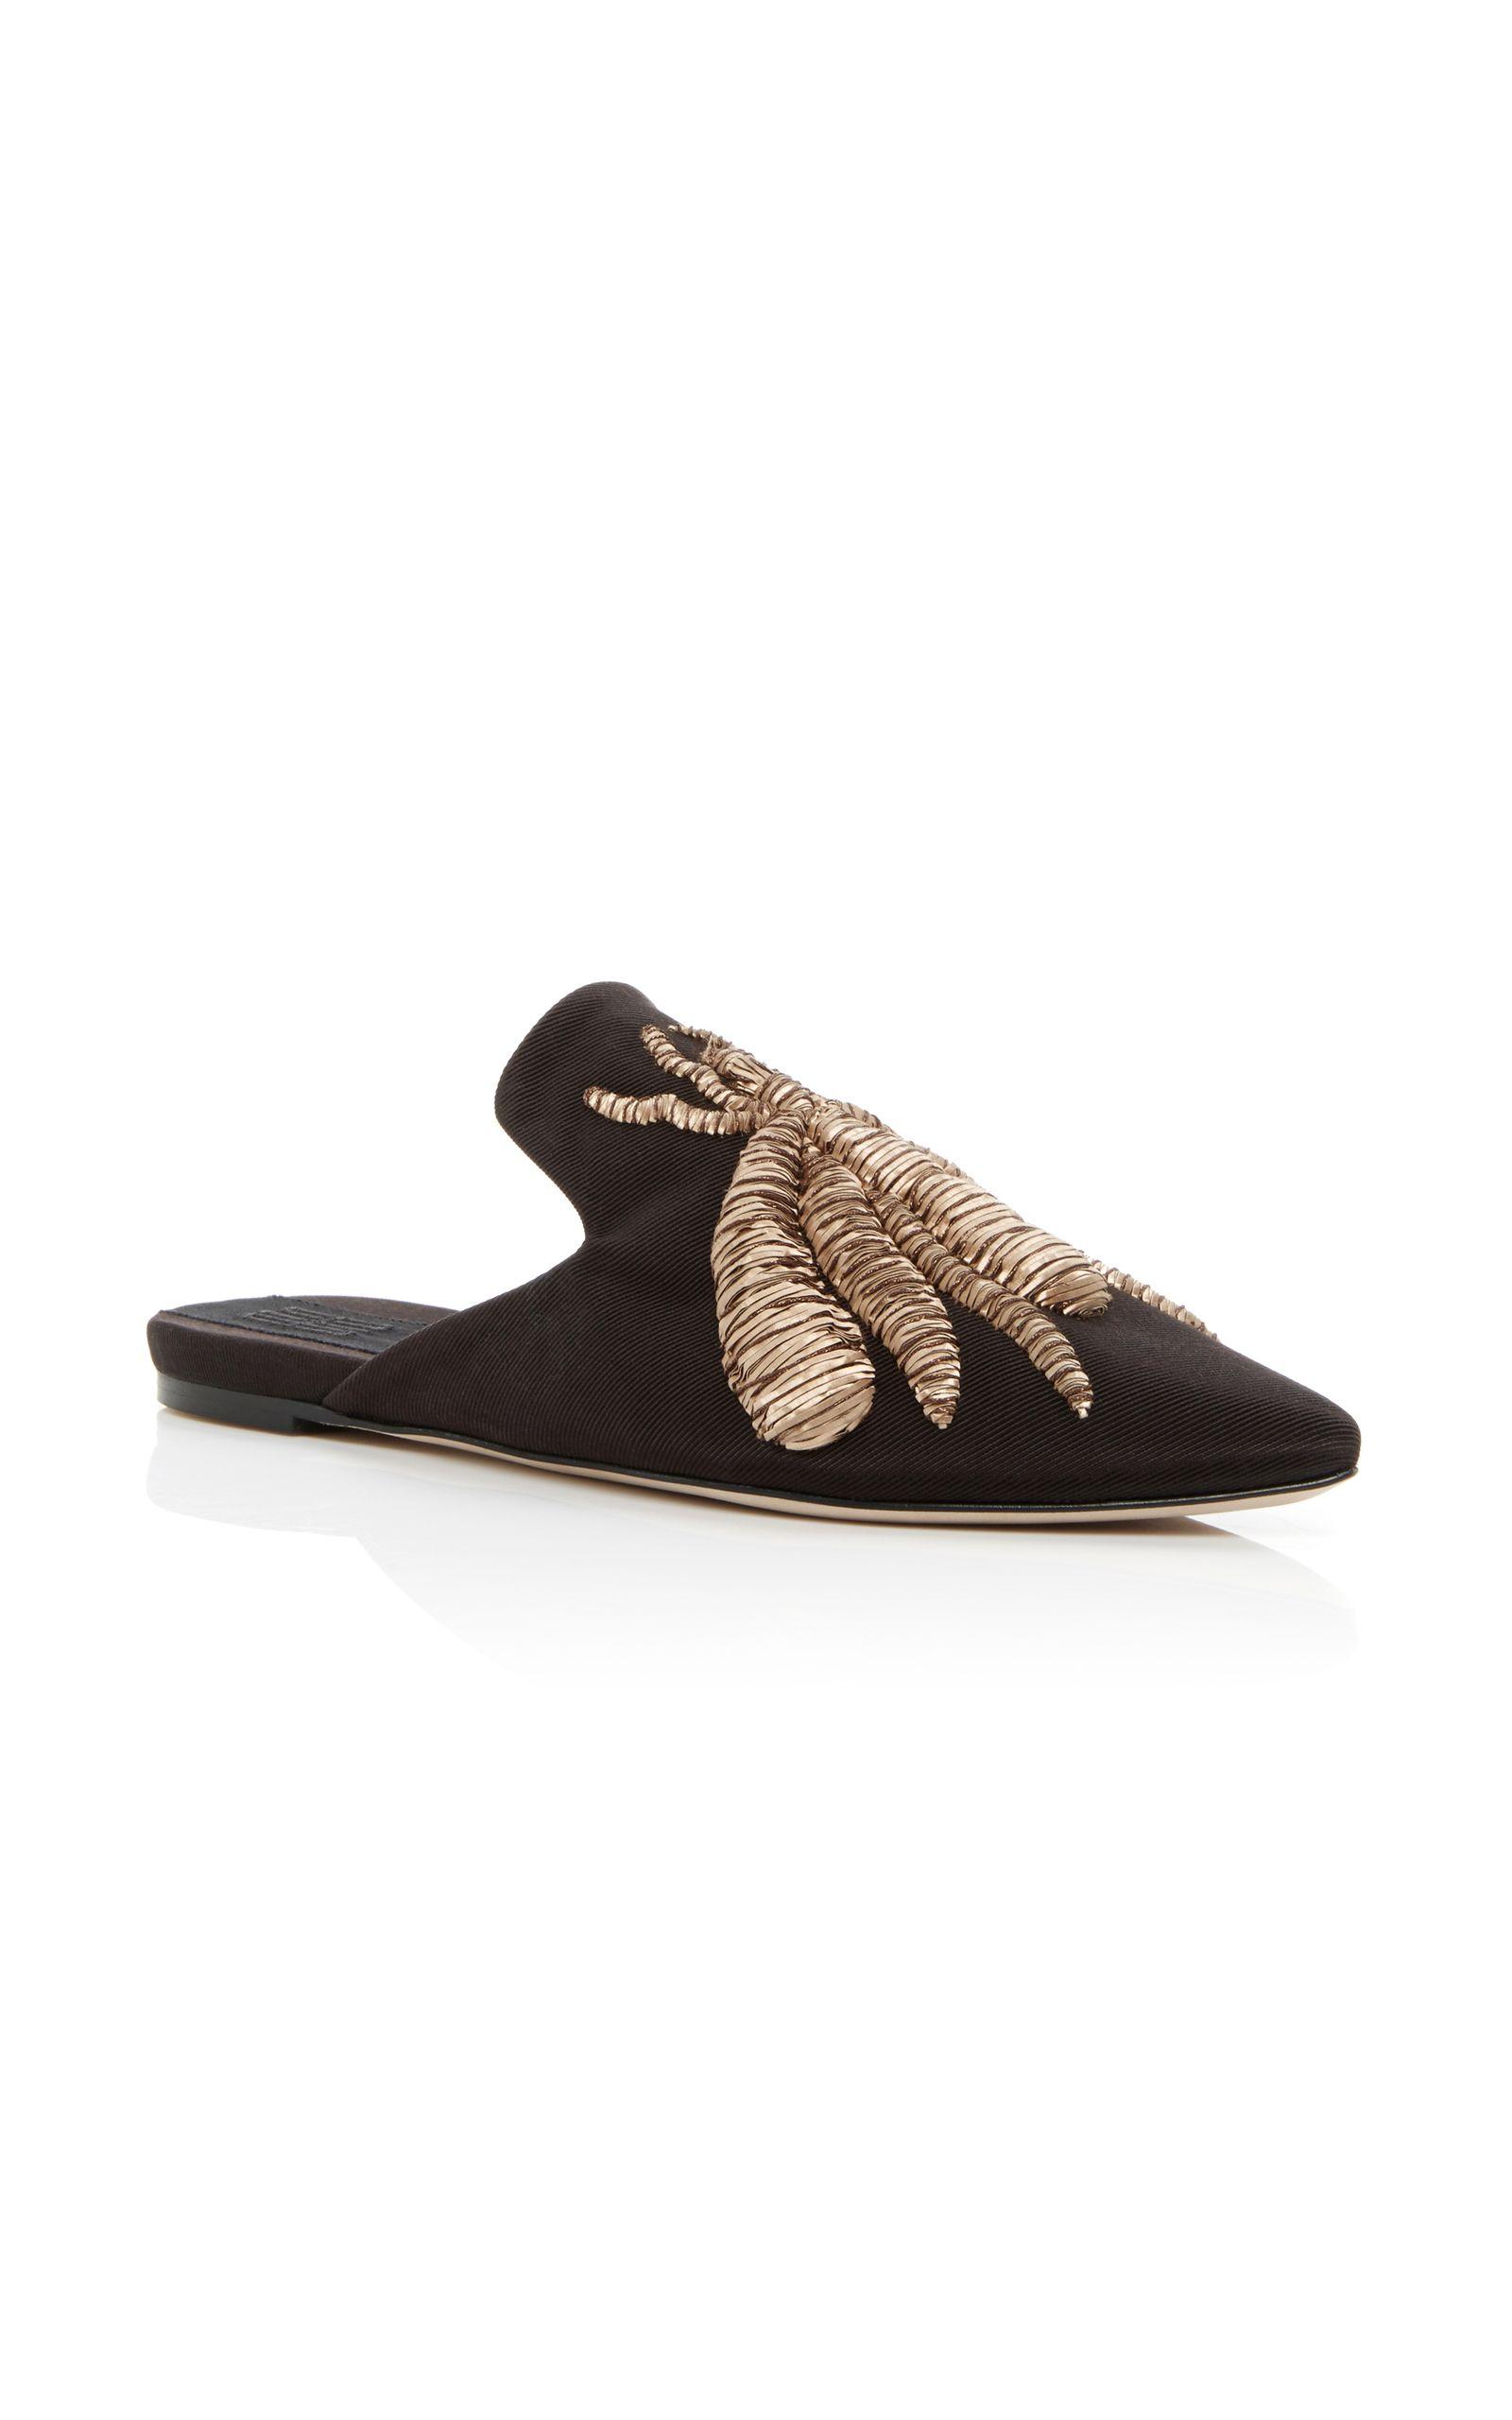 9c188d6cbdd7 SANAYI 313 Embroidered Slippers.  sanayi313  shoes  flats